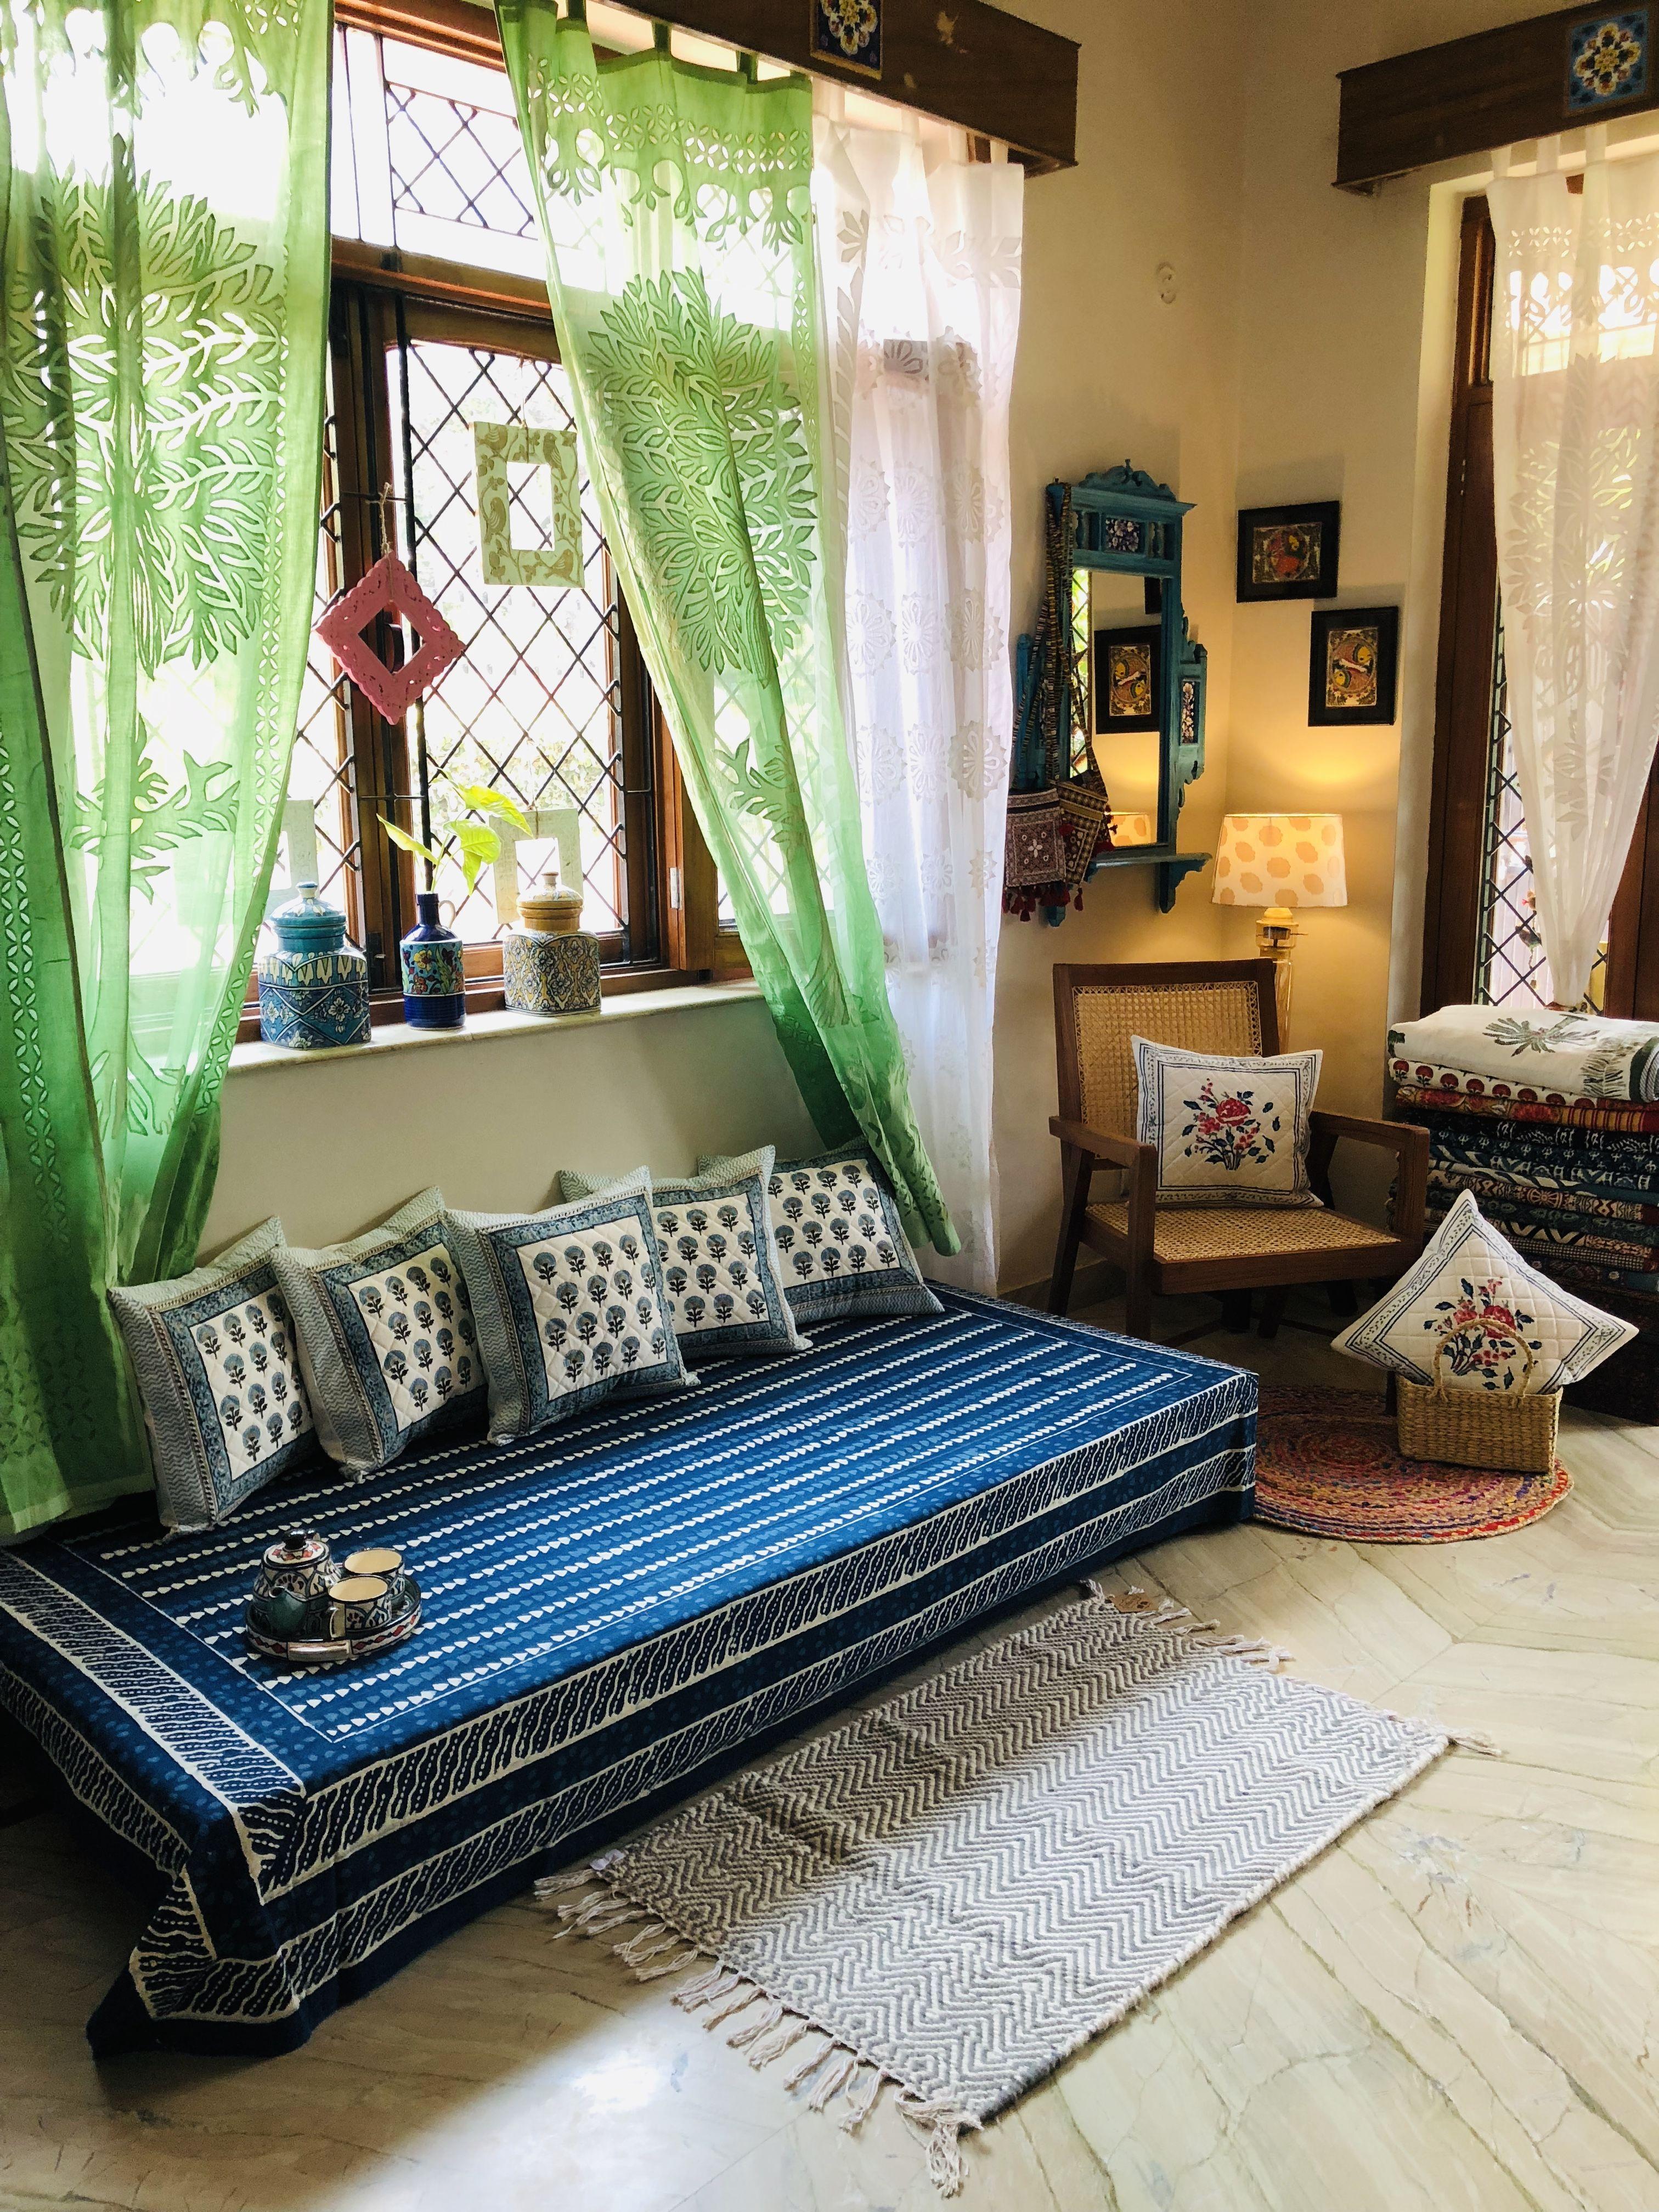 Pin by Hathkargha on Hathkargha home Indian bedroom